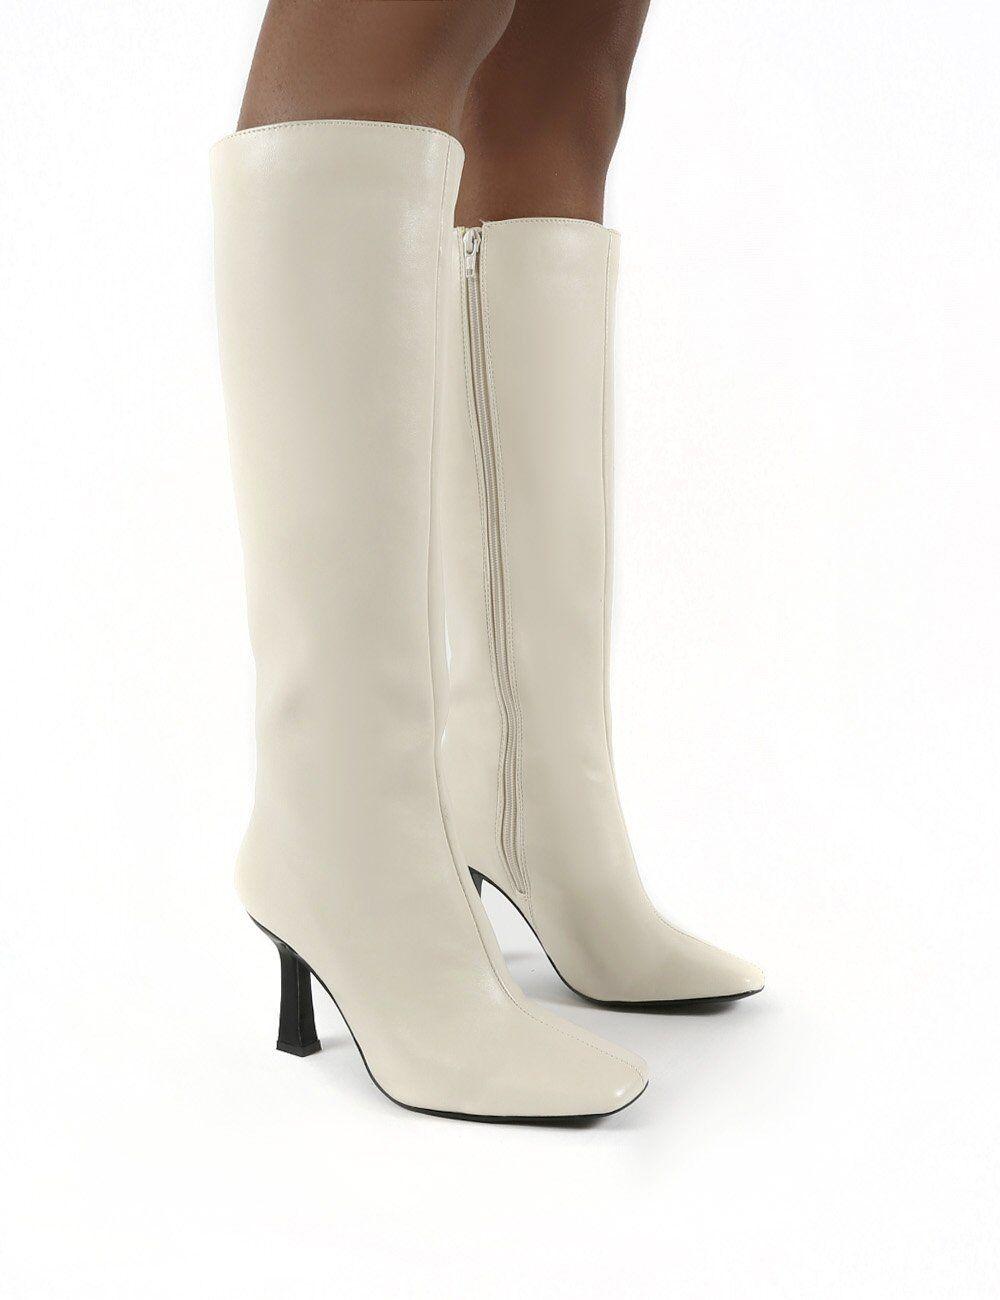 Public Desire US Repeat Bone Pu Heeled Knee High Boots - US 8